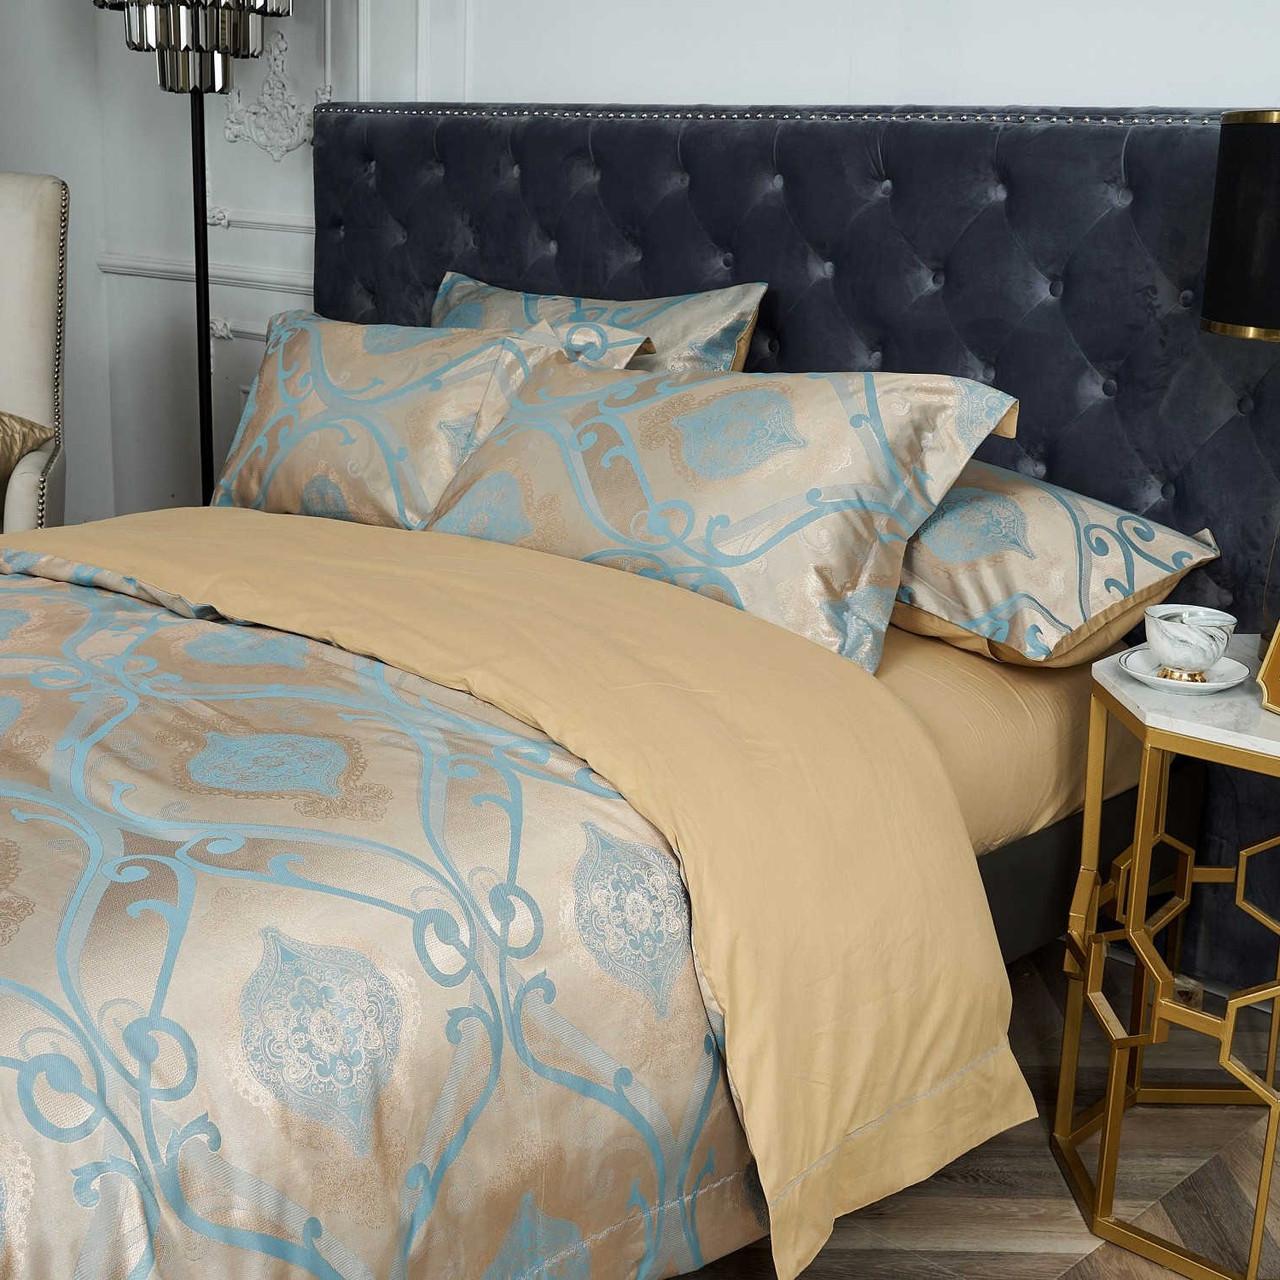 Dropshipping Wholesale-Luxury Jacquard Material Dolce-Mela Bedding DM804K